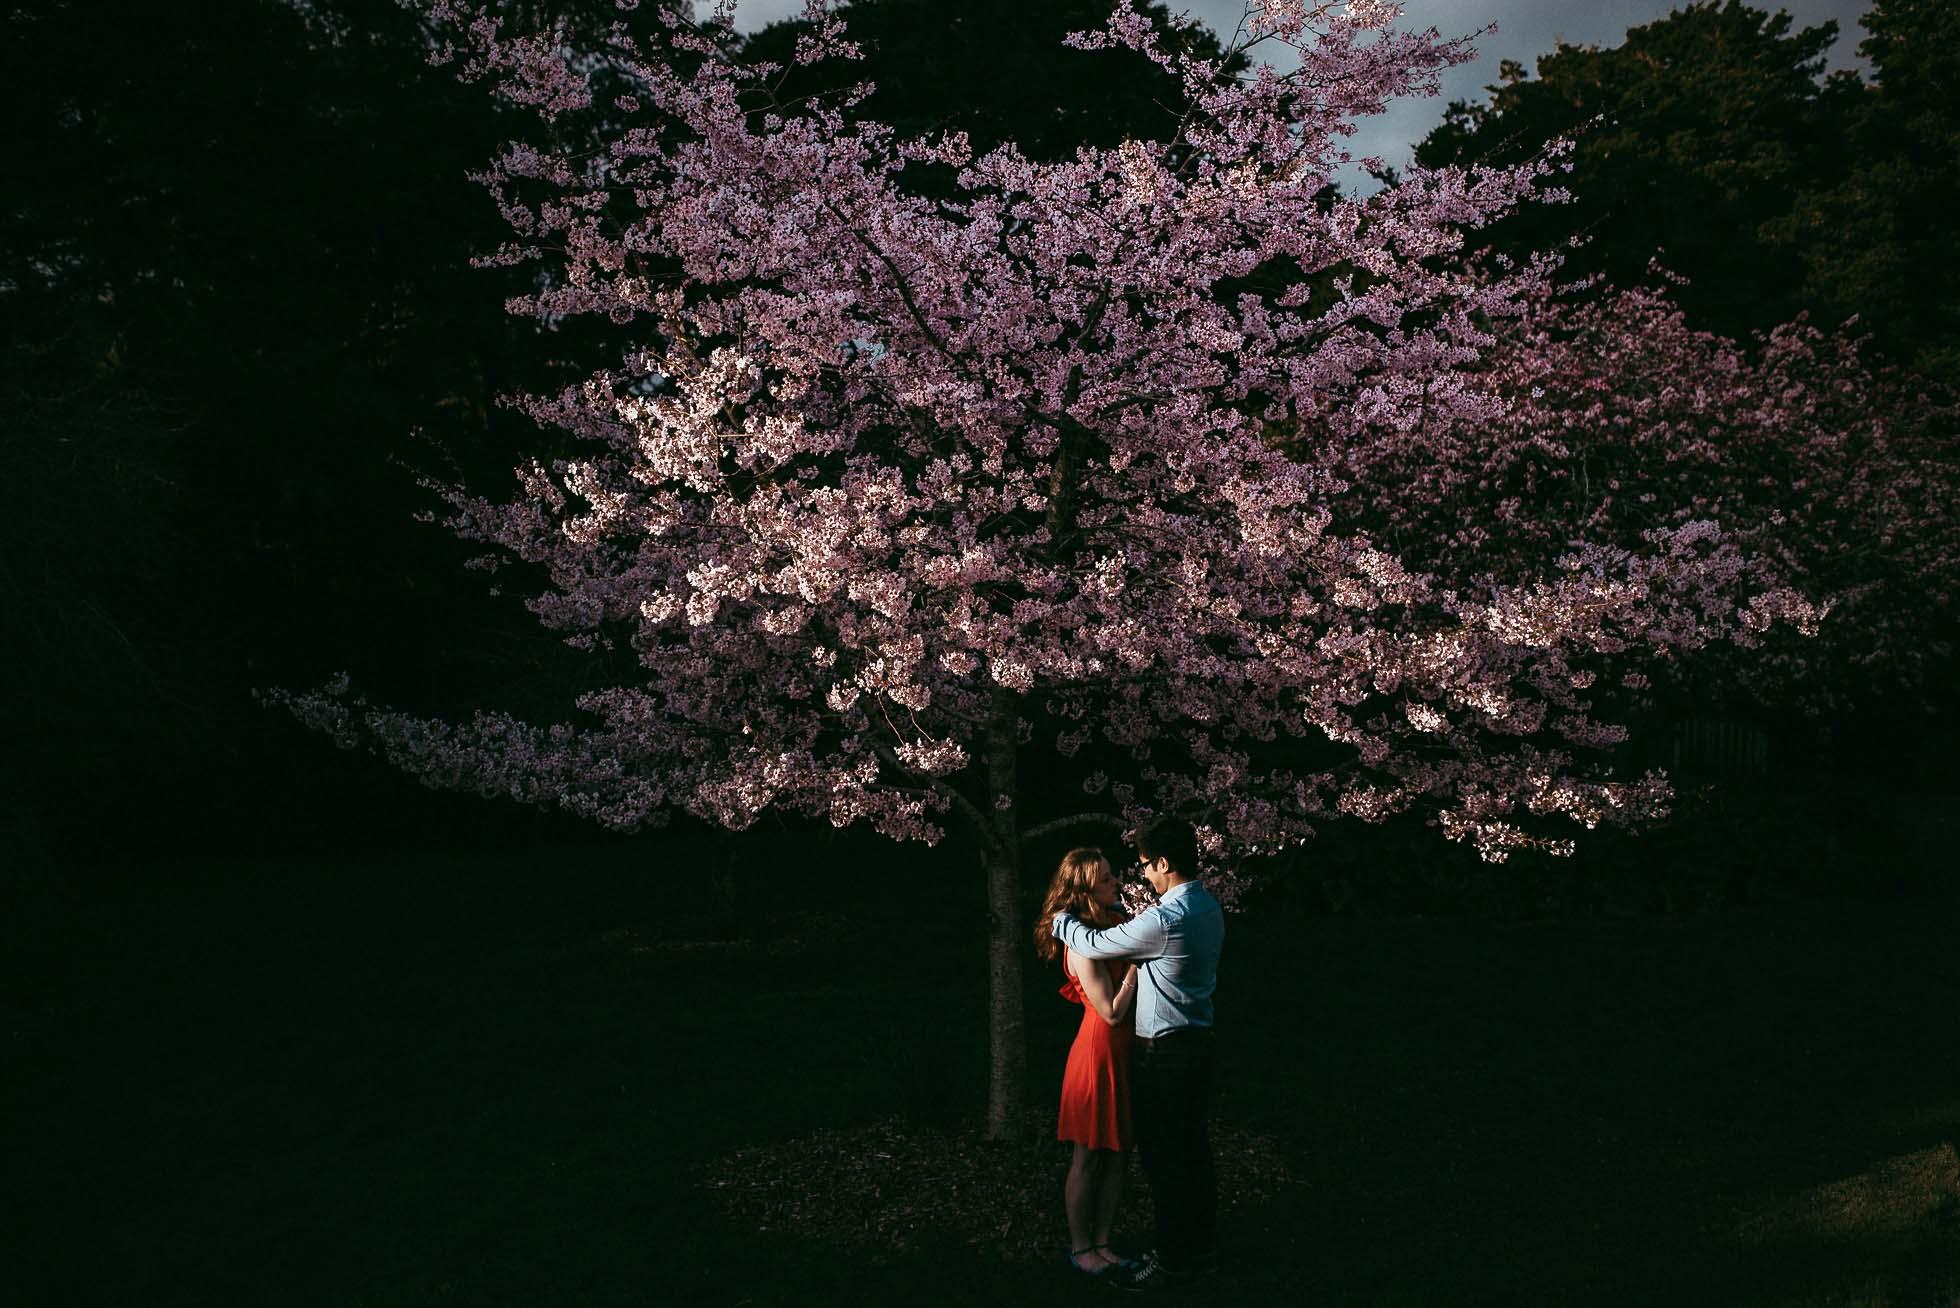 Auckland Botanic Gardens Engagement Session - Spring Cherry Blossom {Waikato wedding photographer}